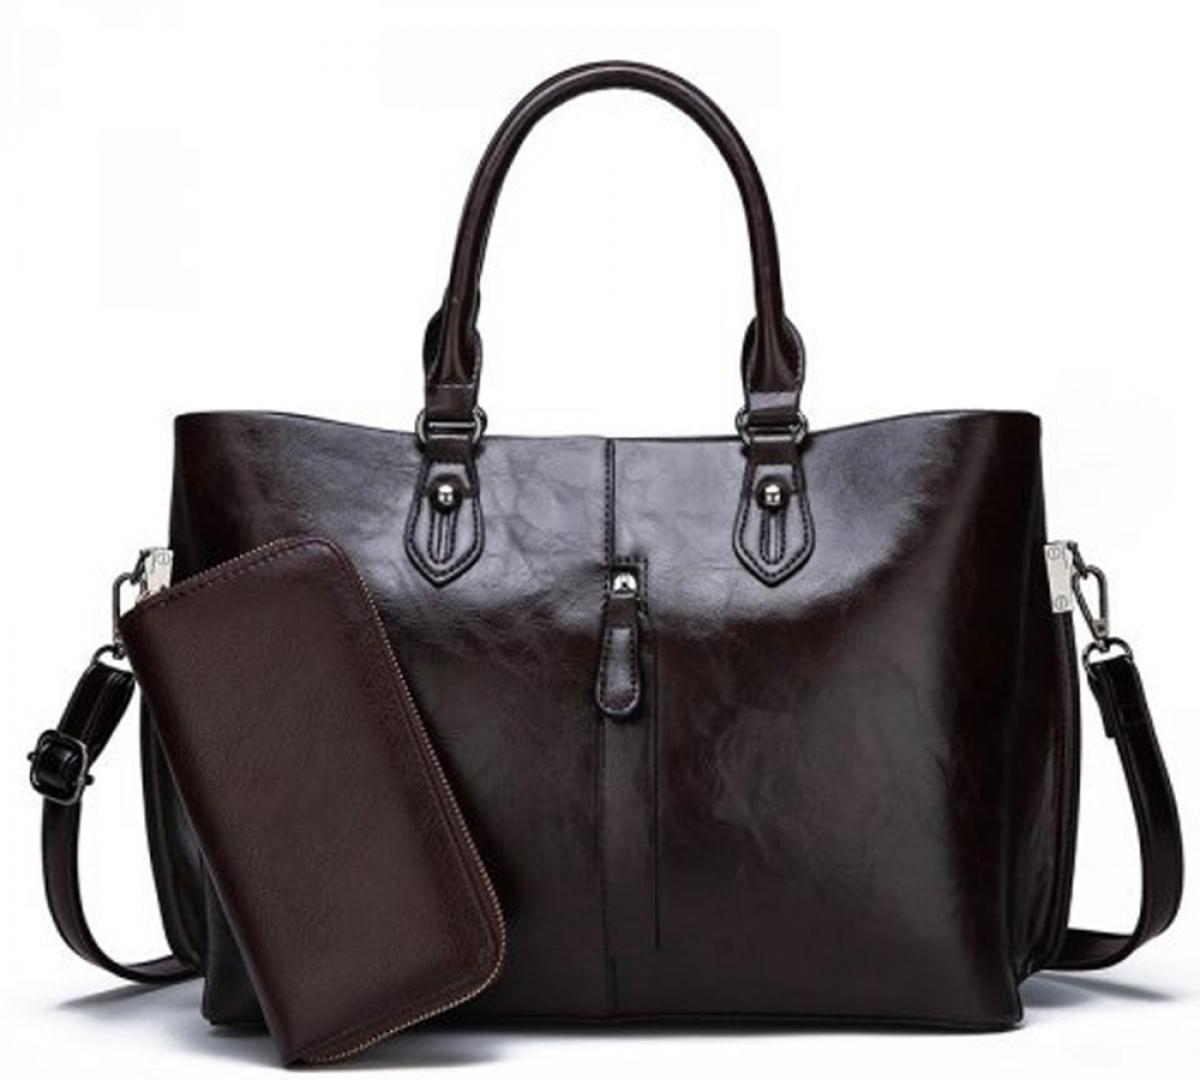 Handbags are also very popular among women.